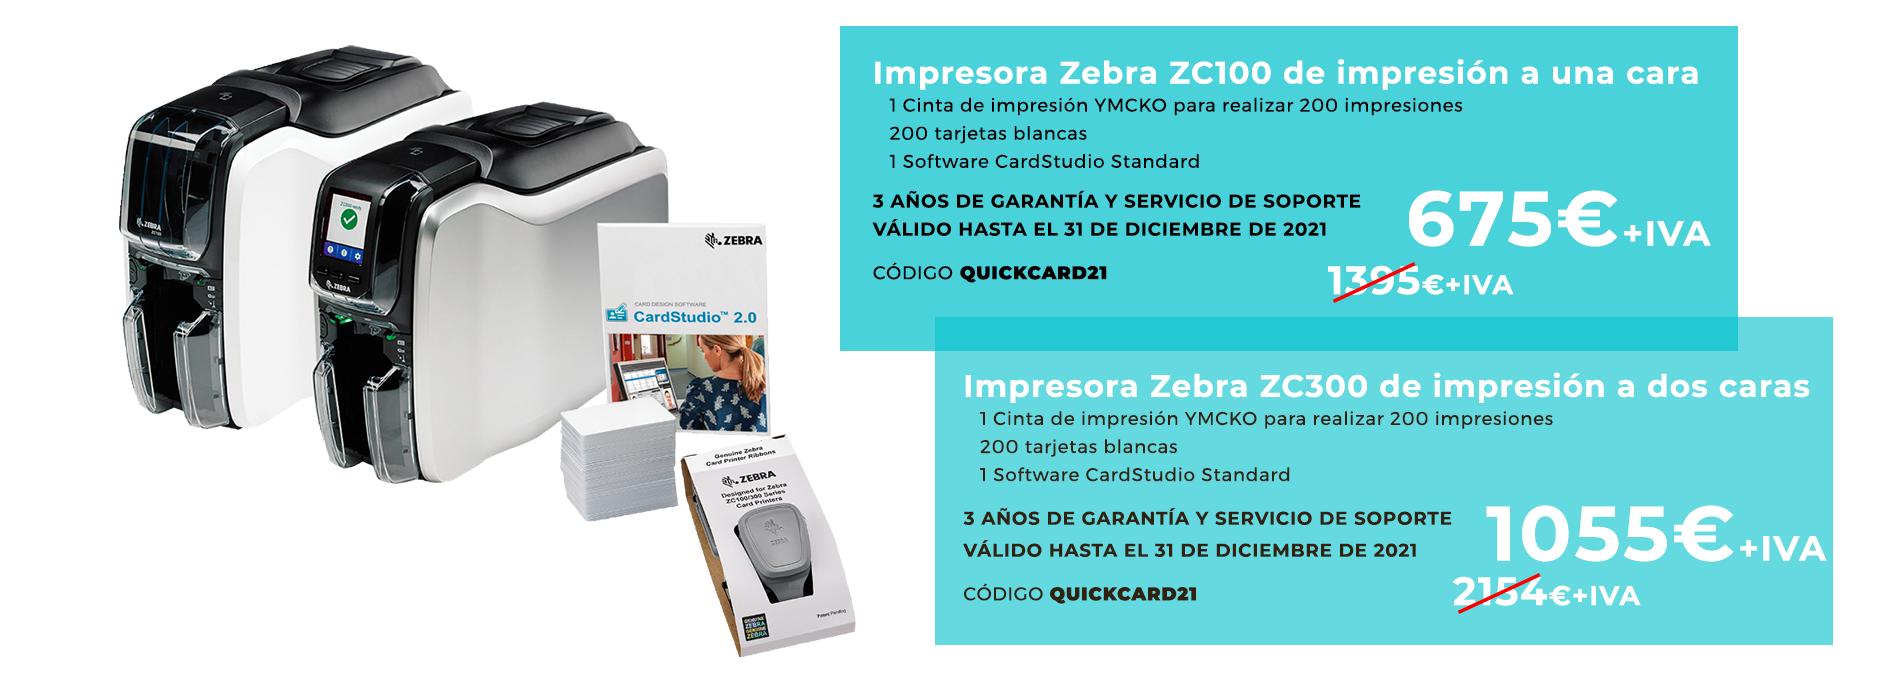 slider1DEFB - Sipcards: La mejor oferta de Impresoras y tarjetas PVC